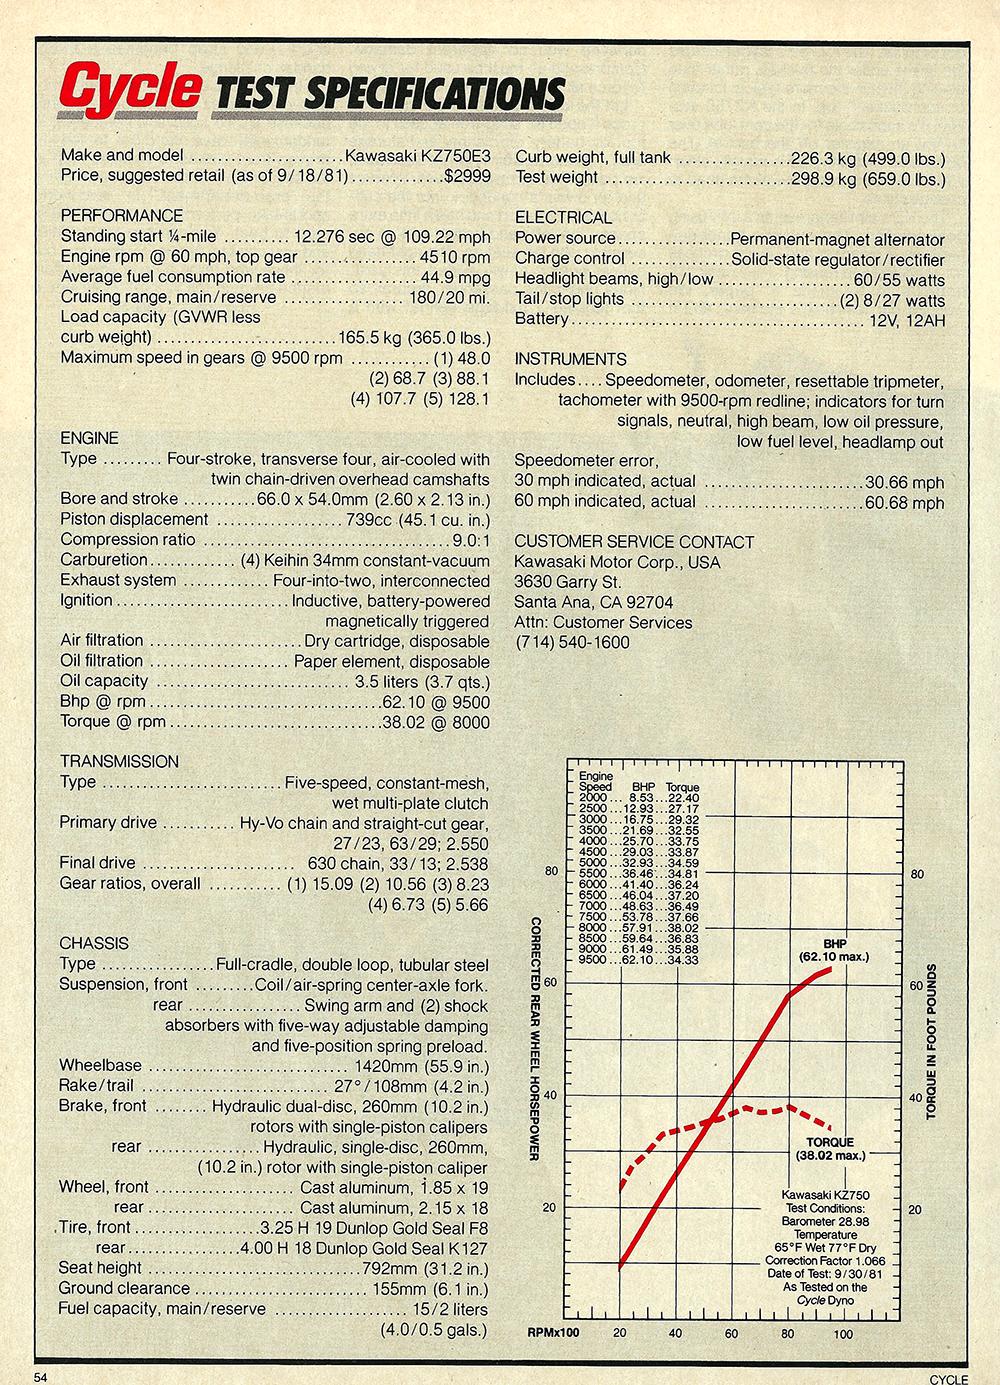 1982 Kawasaki kz750 road test 07.JPG